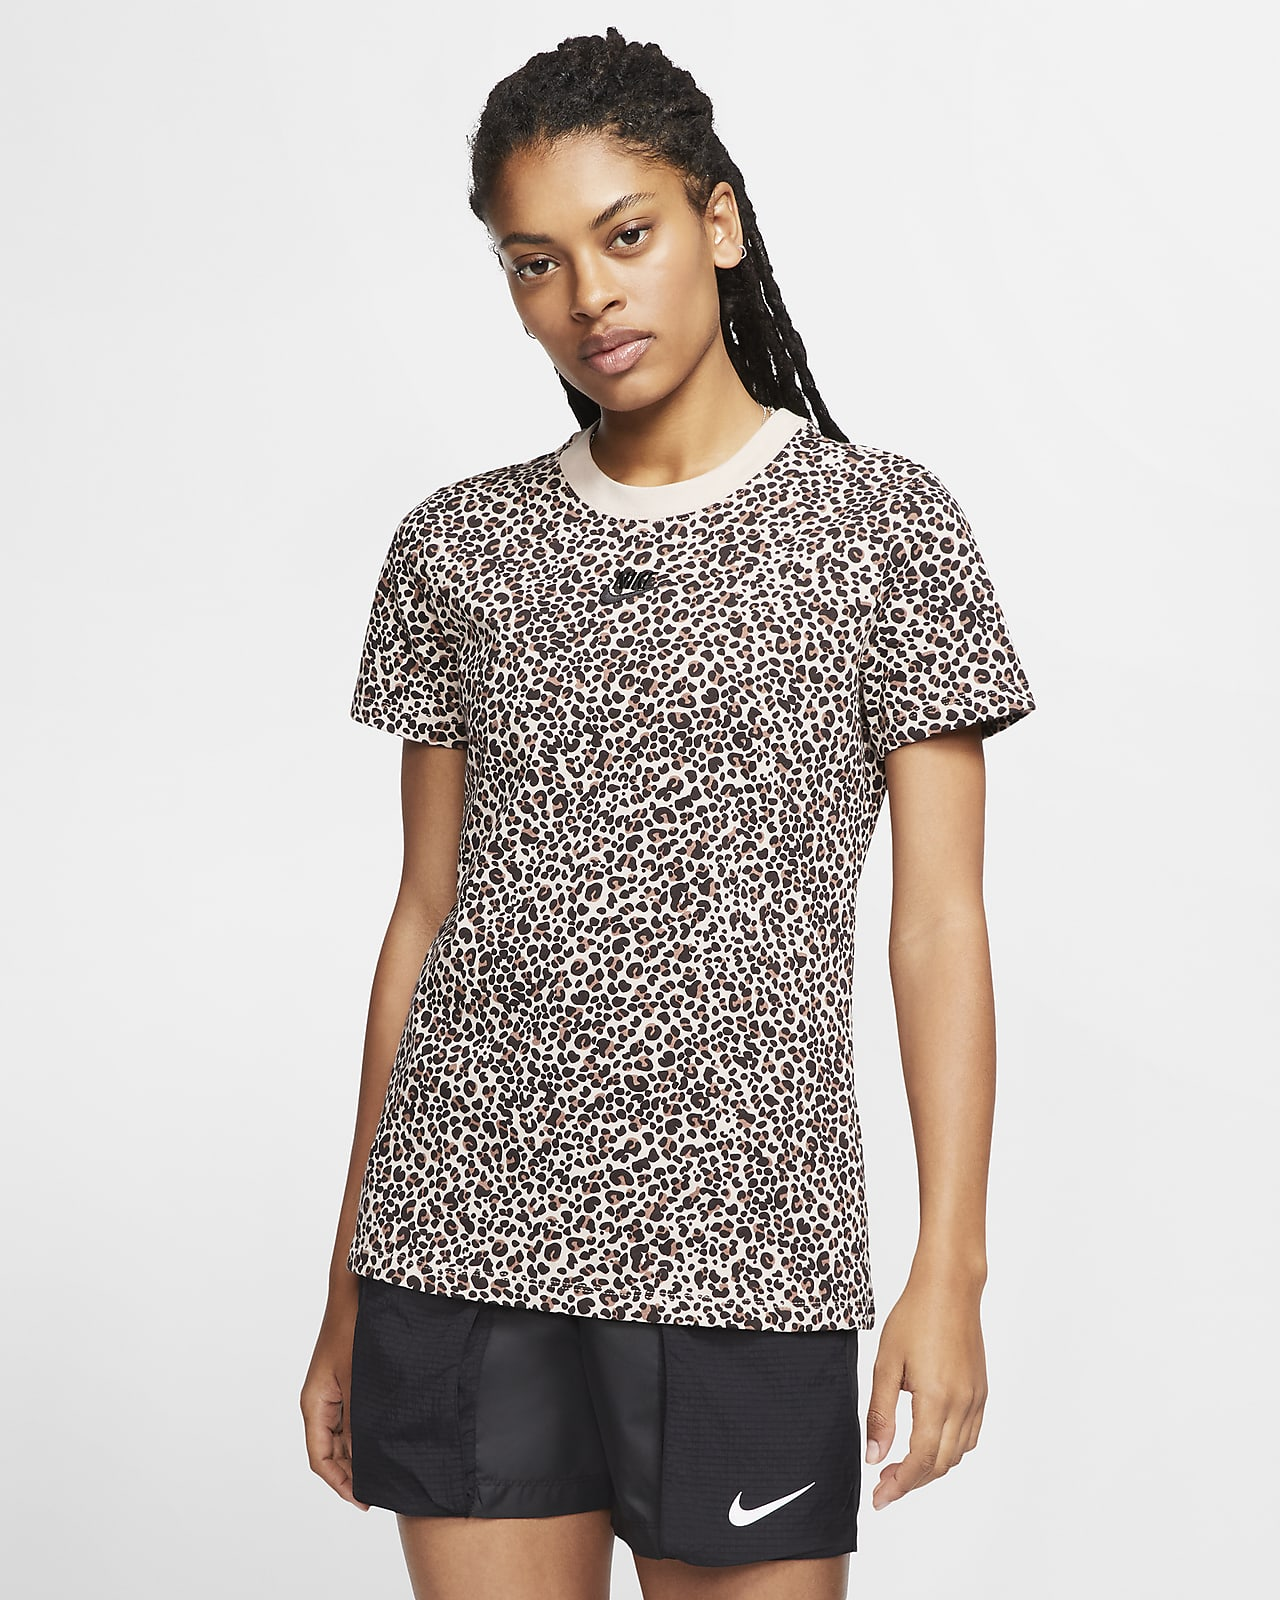 Nike Sportswear Women's Animal Print T-Shirt